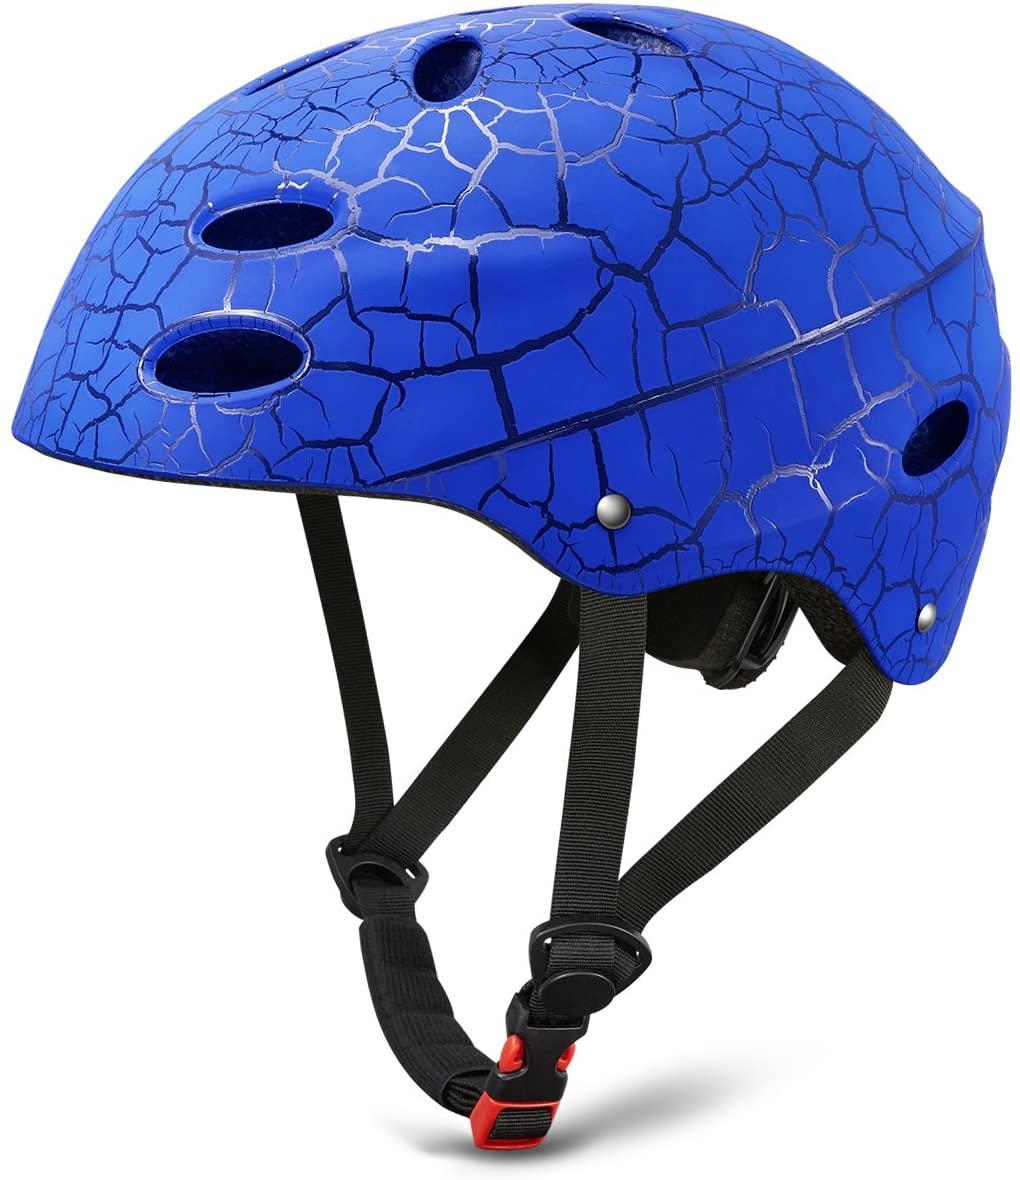 KUSTAR Kids Skateboard Helmet,Adjustable Bike Helmet, Skate Helmet for Safety Cycling/Skating/Scooter/Inline Skating, CPSC Certified for Youth/Teens Boys Girls